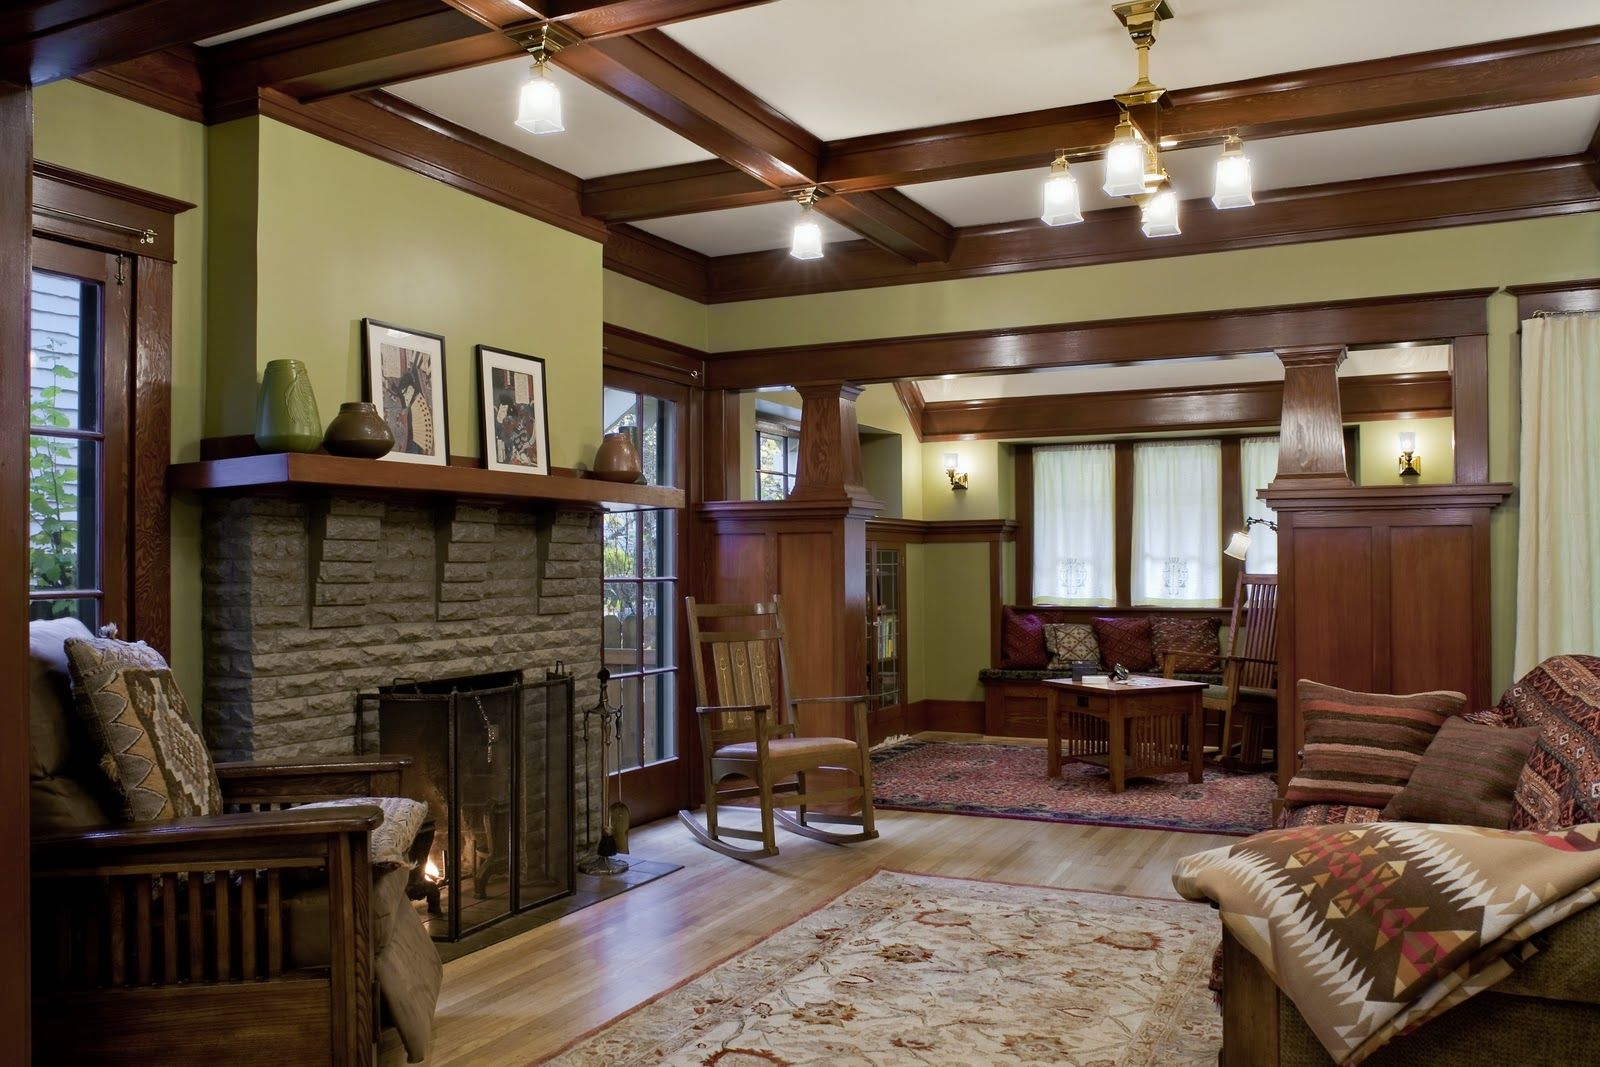 craftsman interior paint colors home design craftsman on interior house paint colors id=73541